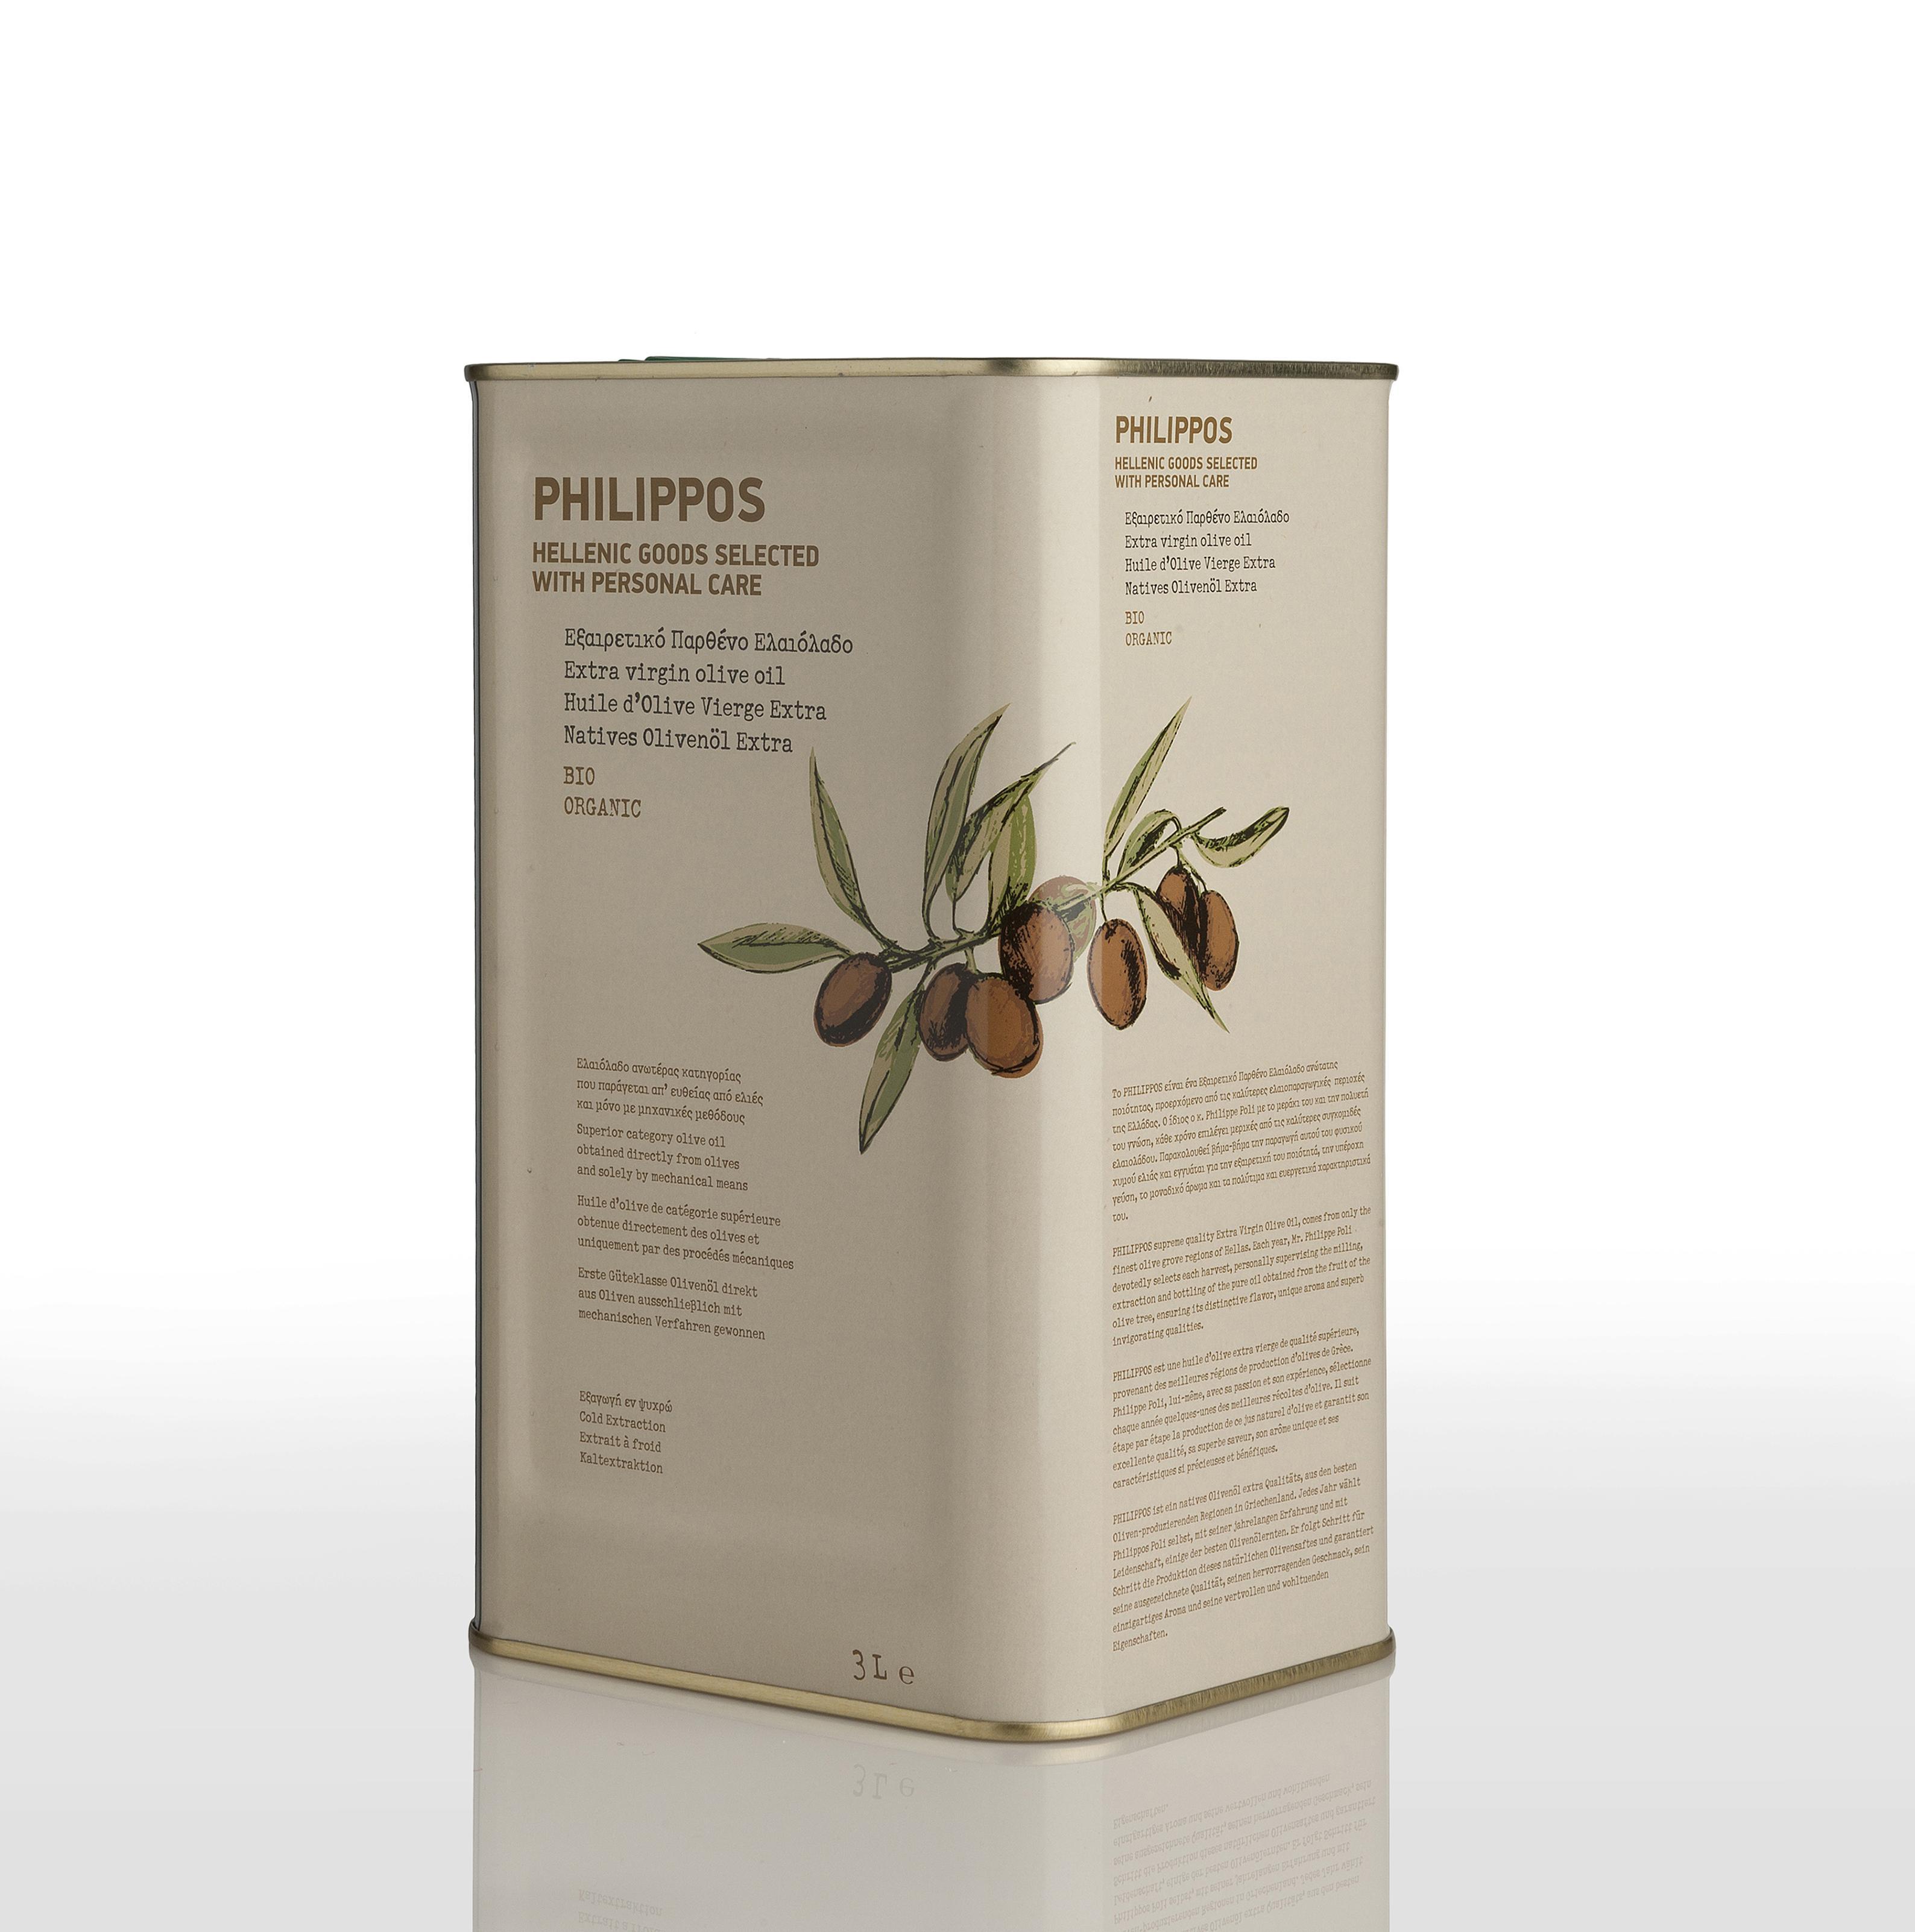 PHILIPPOS ORGANIC Extra Virgin Olive Oil 3L